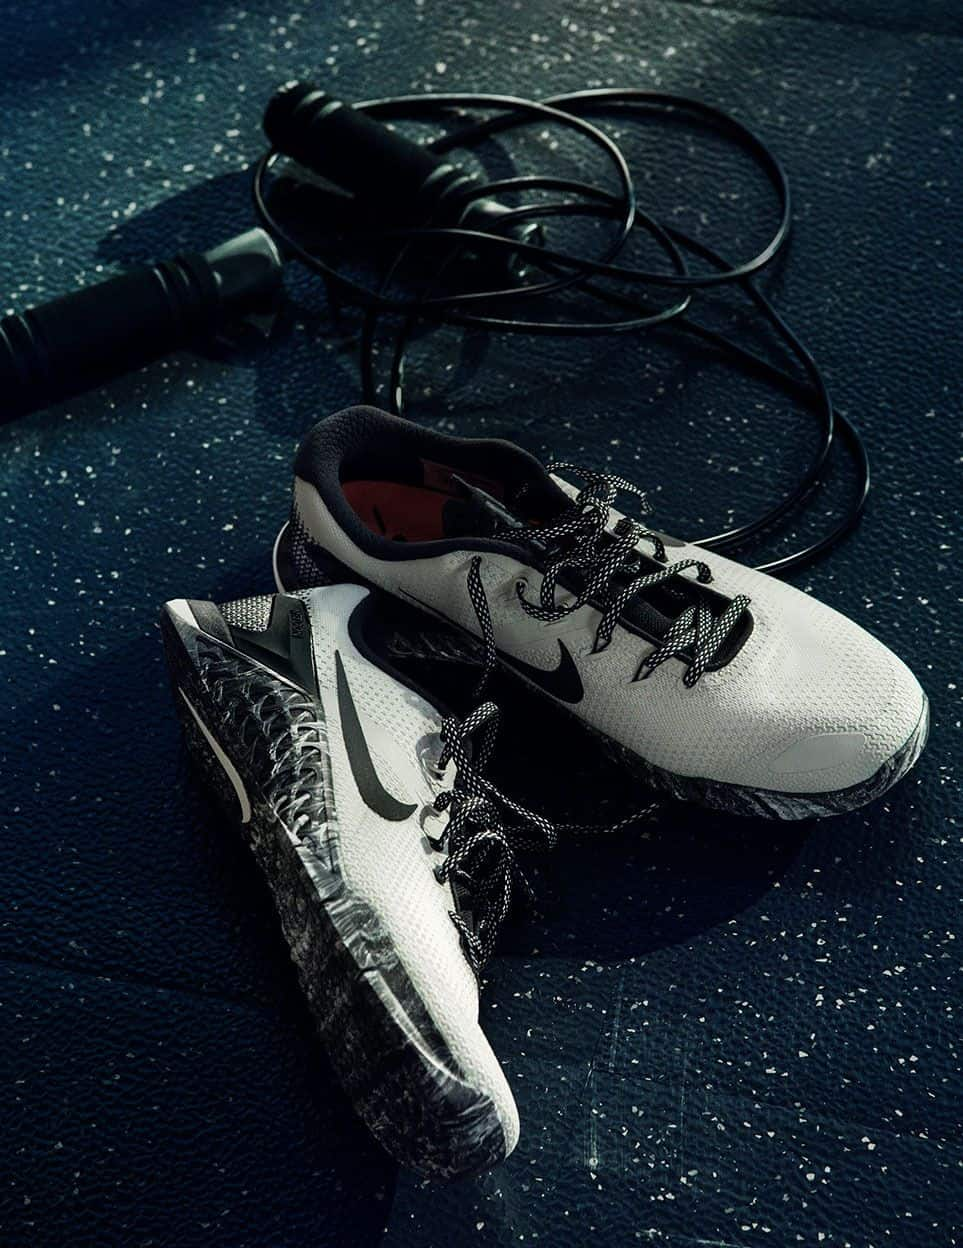 Nike Metcon 4 - Nike's next generation CrossFit training shoe